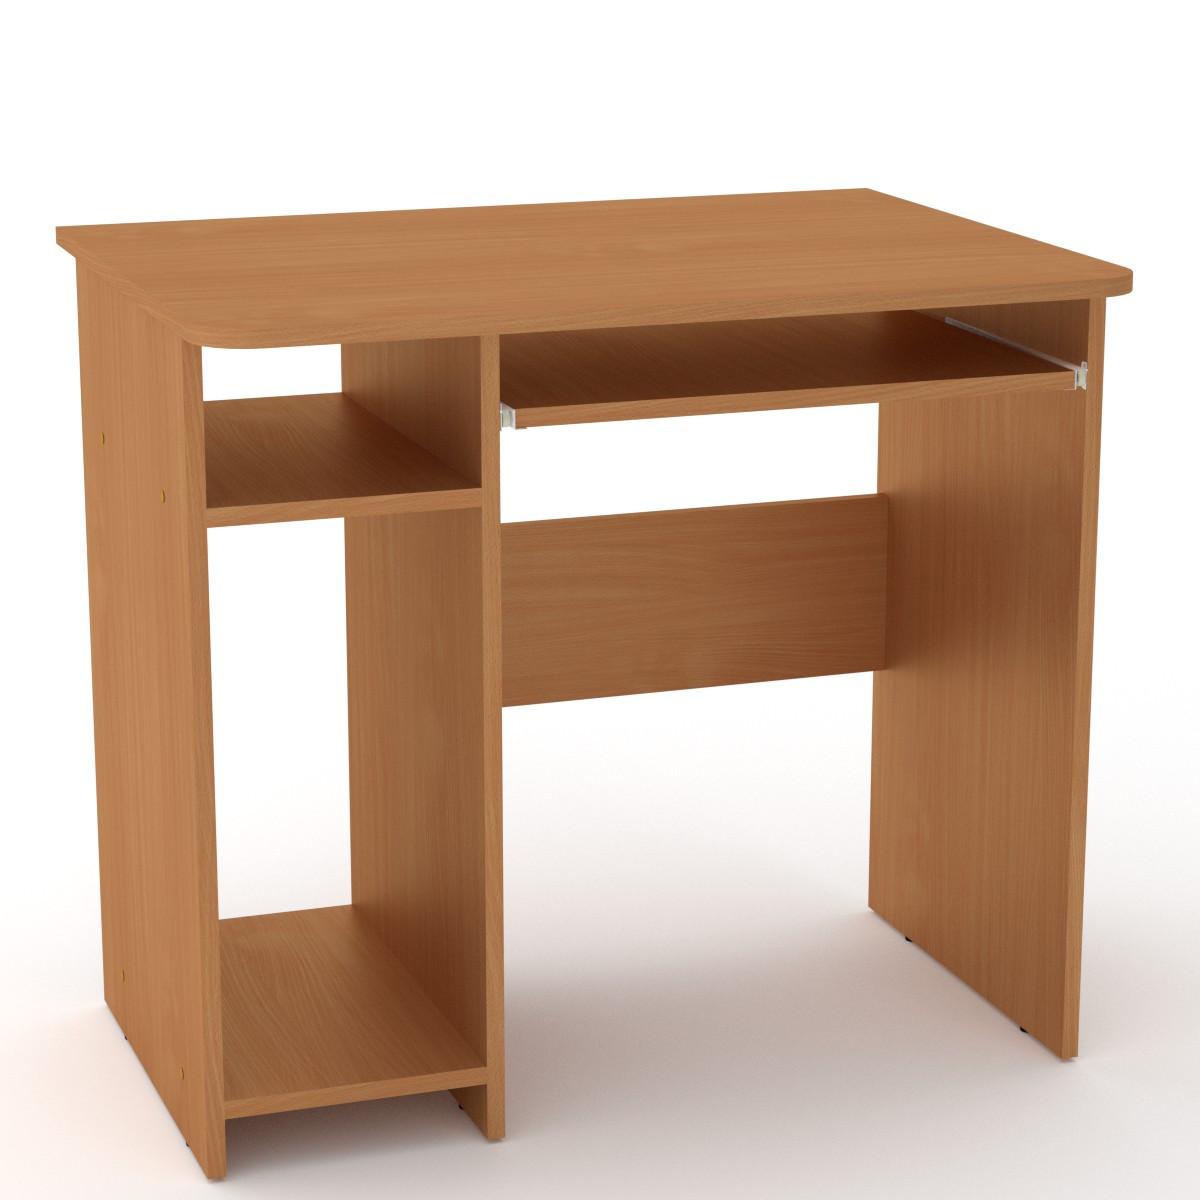 Стол компьютерный СКМ-12 бук Компанит (82х60х74 см)